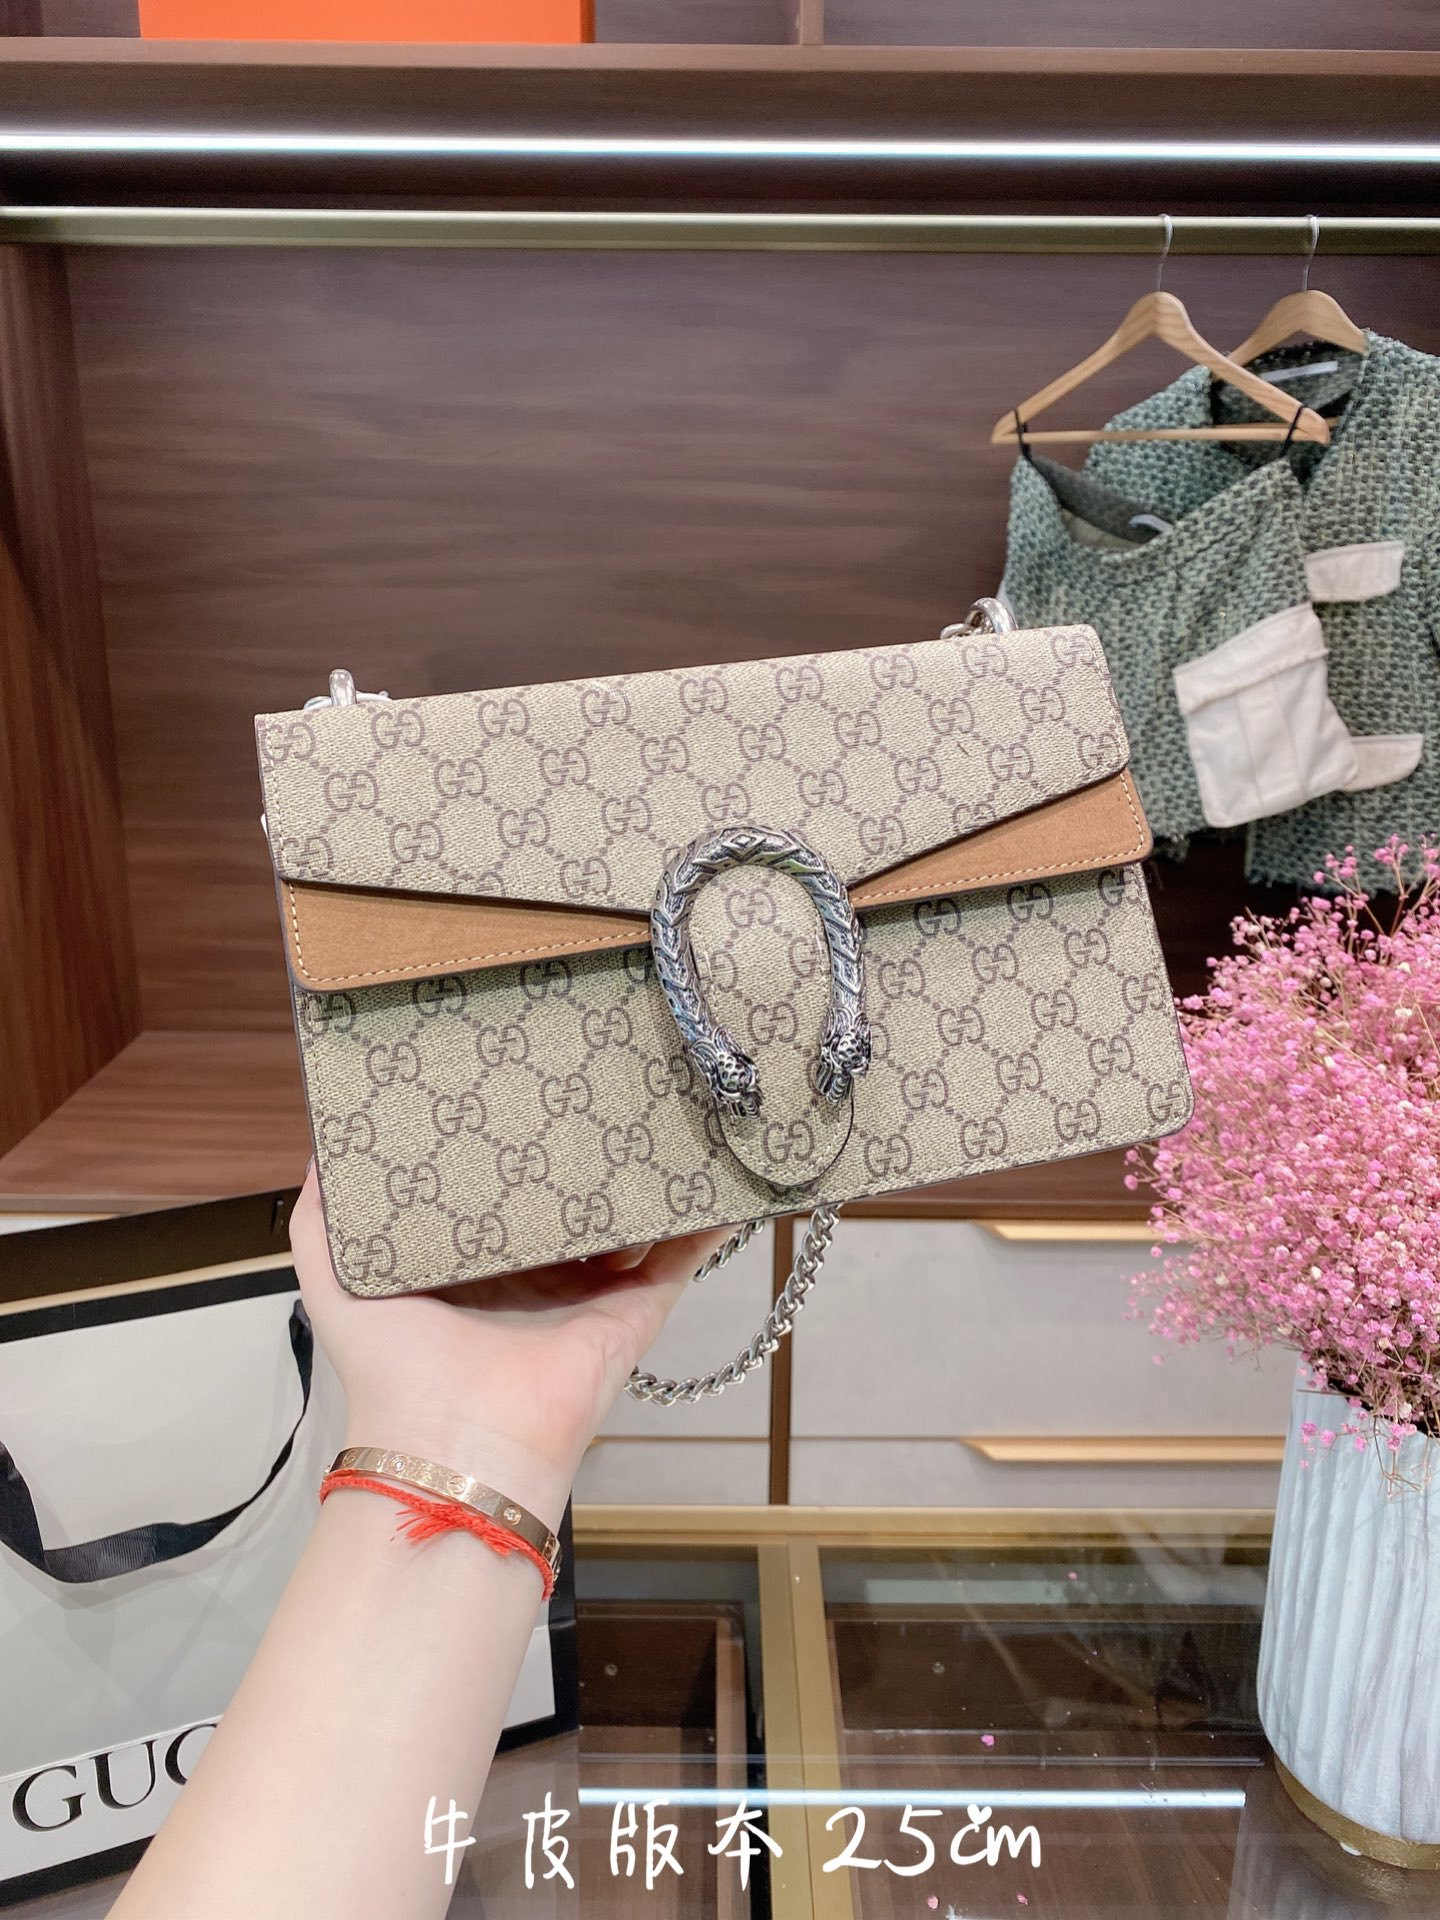 dionysus leather clutch women slingbag chain shoulder bag for gucci กระเป๋าสะพายข้างผู้หญิง